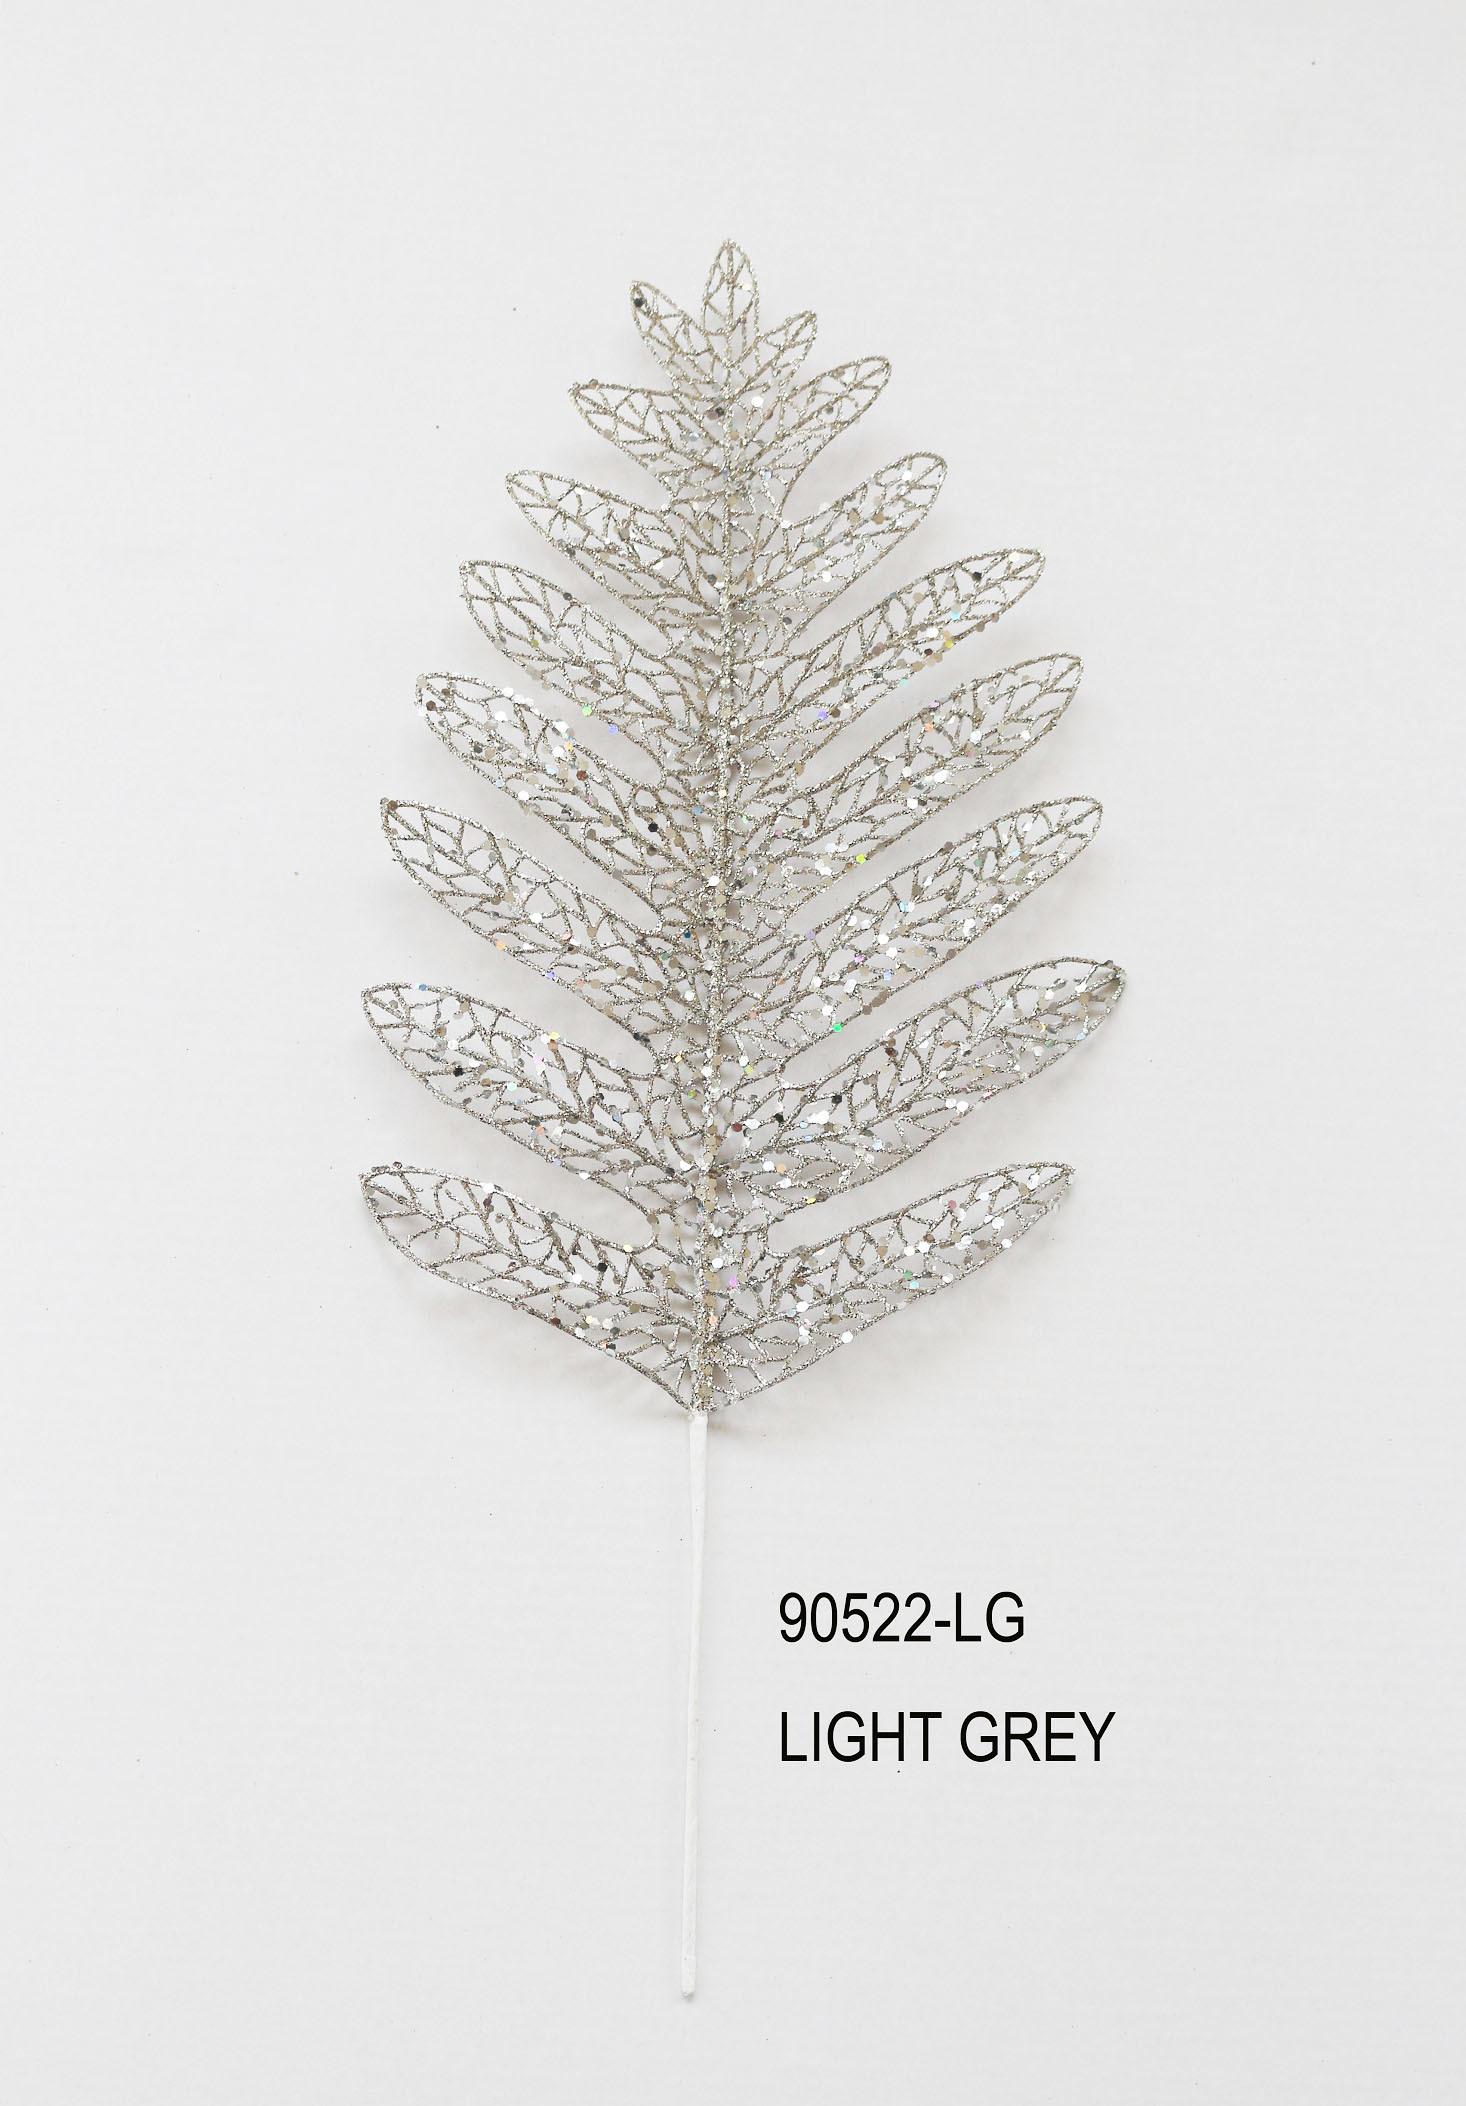 90522-LG